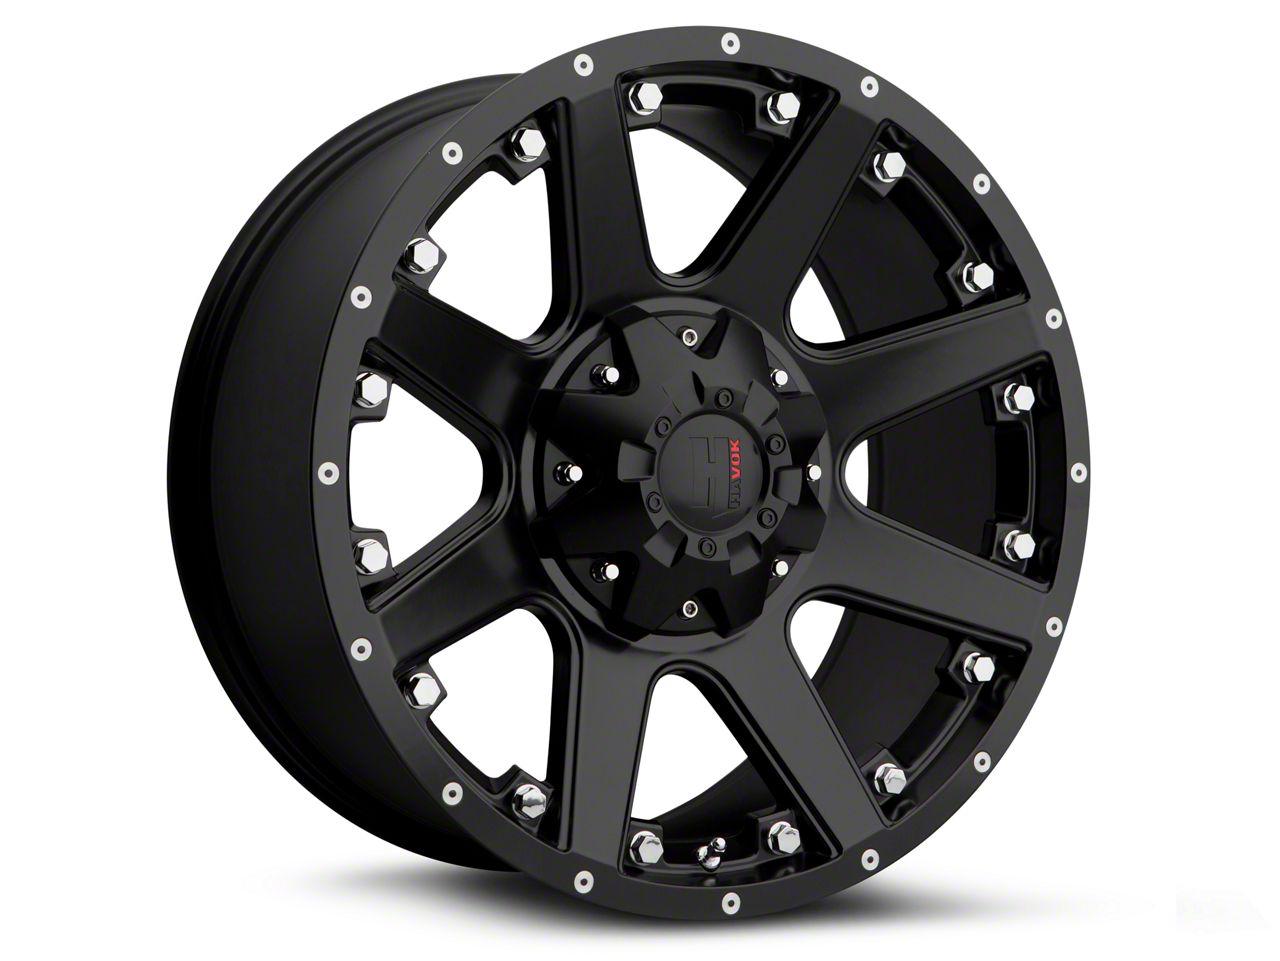 Havok Off-Road H102 Matte Black 6-Lug Wheel - 18x9 (09-14 F-150)